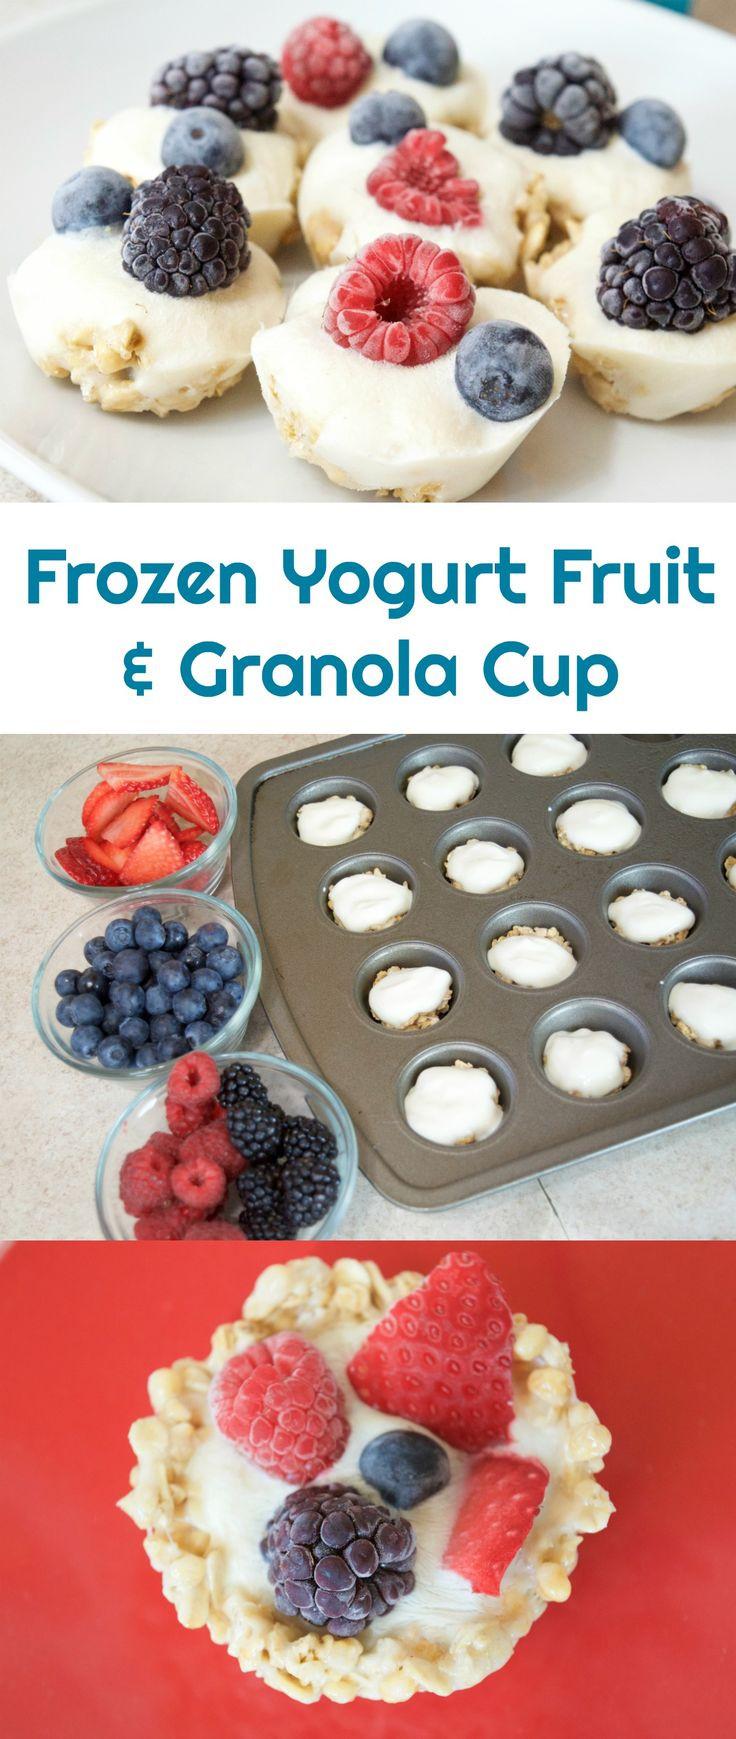 Can You Eat Yogurt On Keto Diet  Best 25 Freeze school lunches ideas on Pinterest